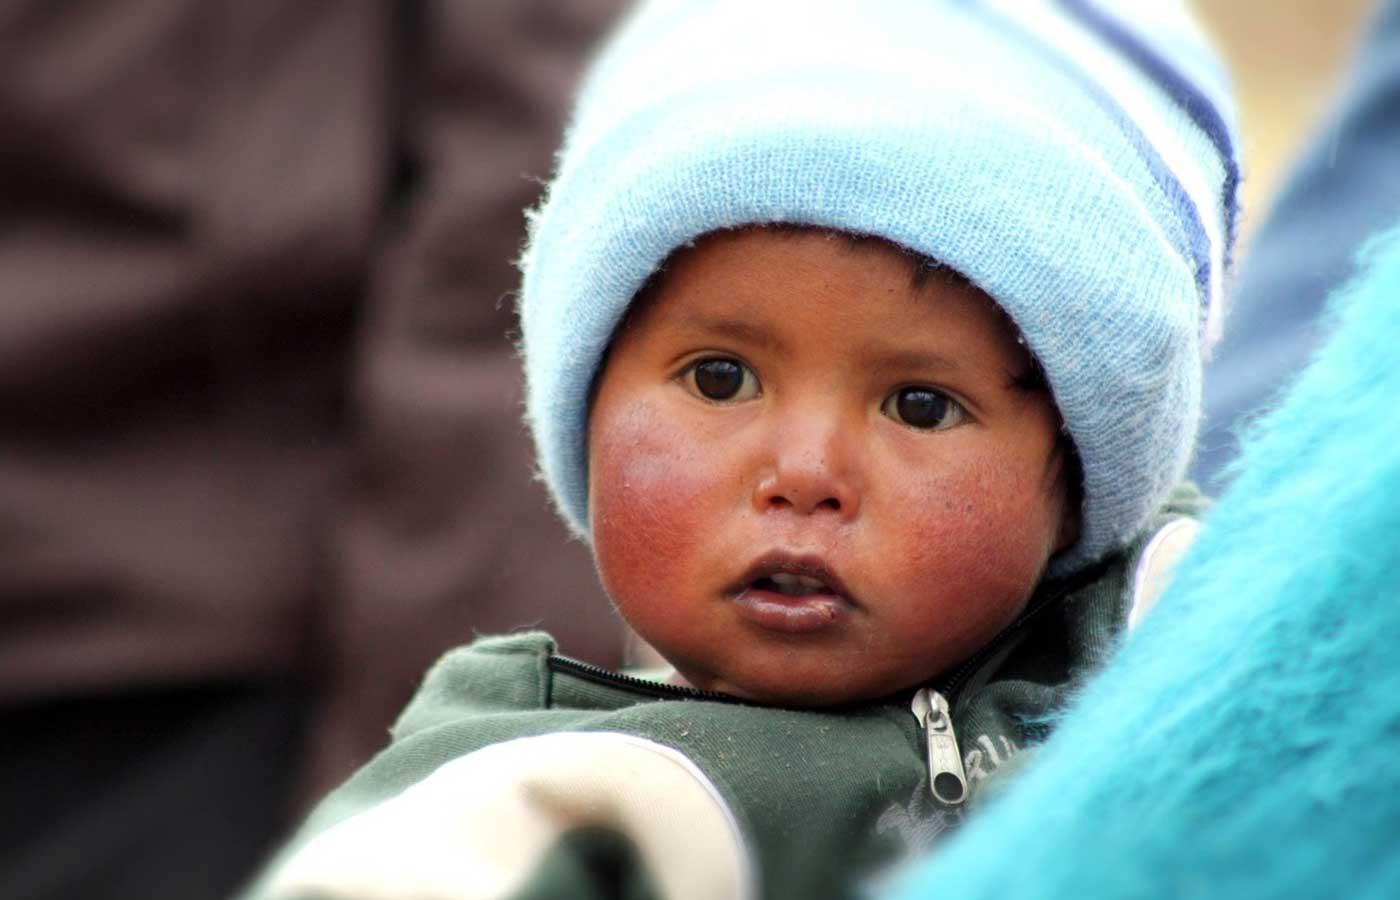 Bolivia's child